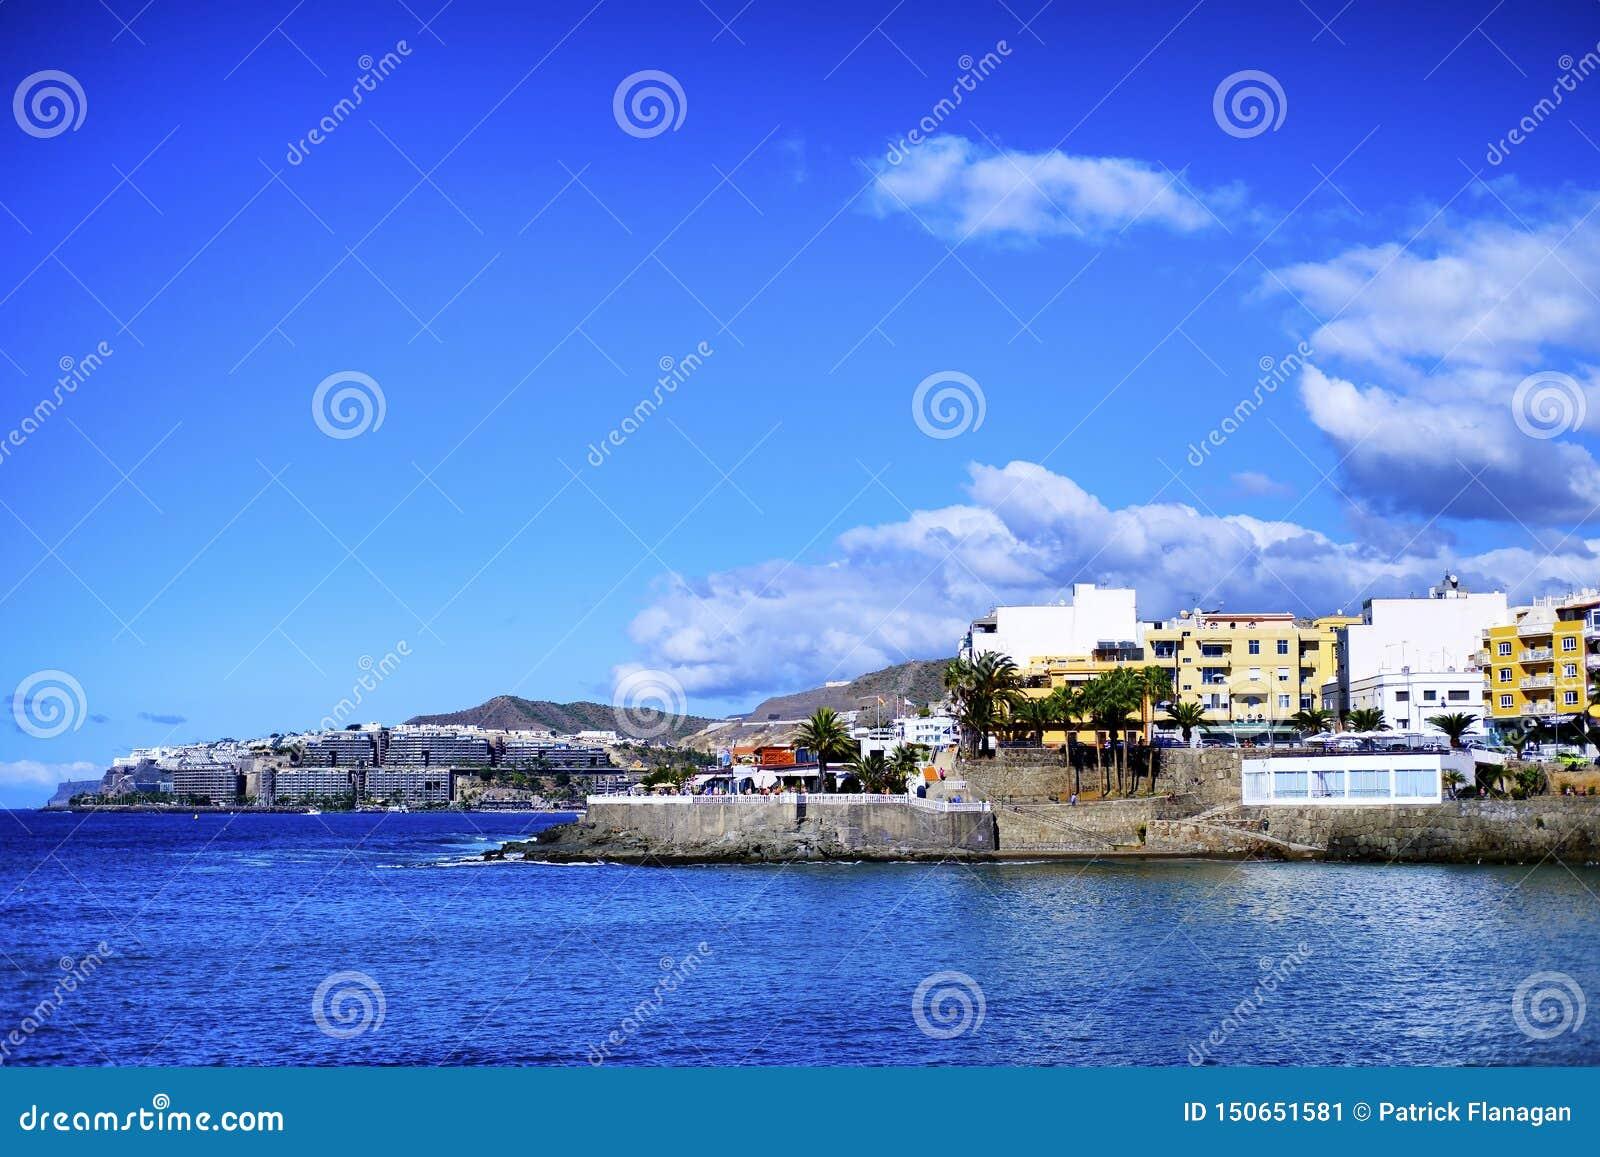 Un paisaje costero de Arguineguin en Gran Canaria